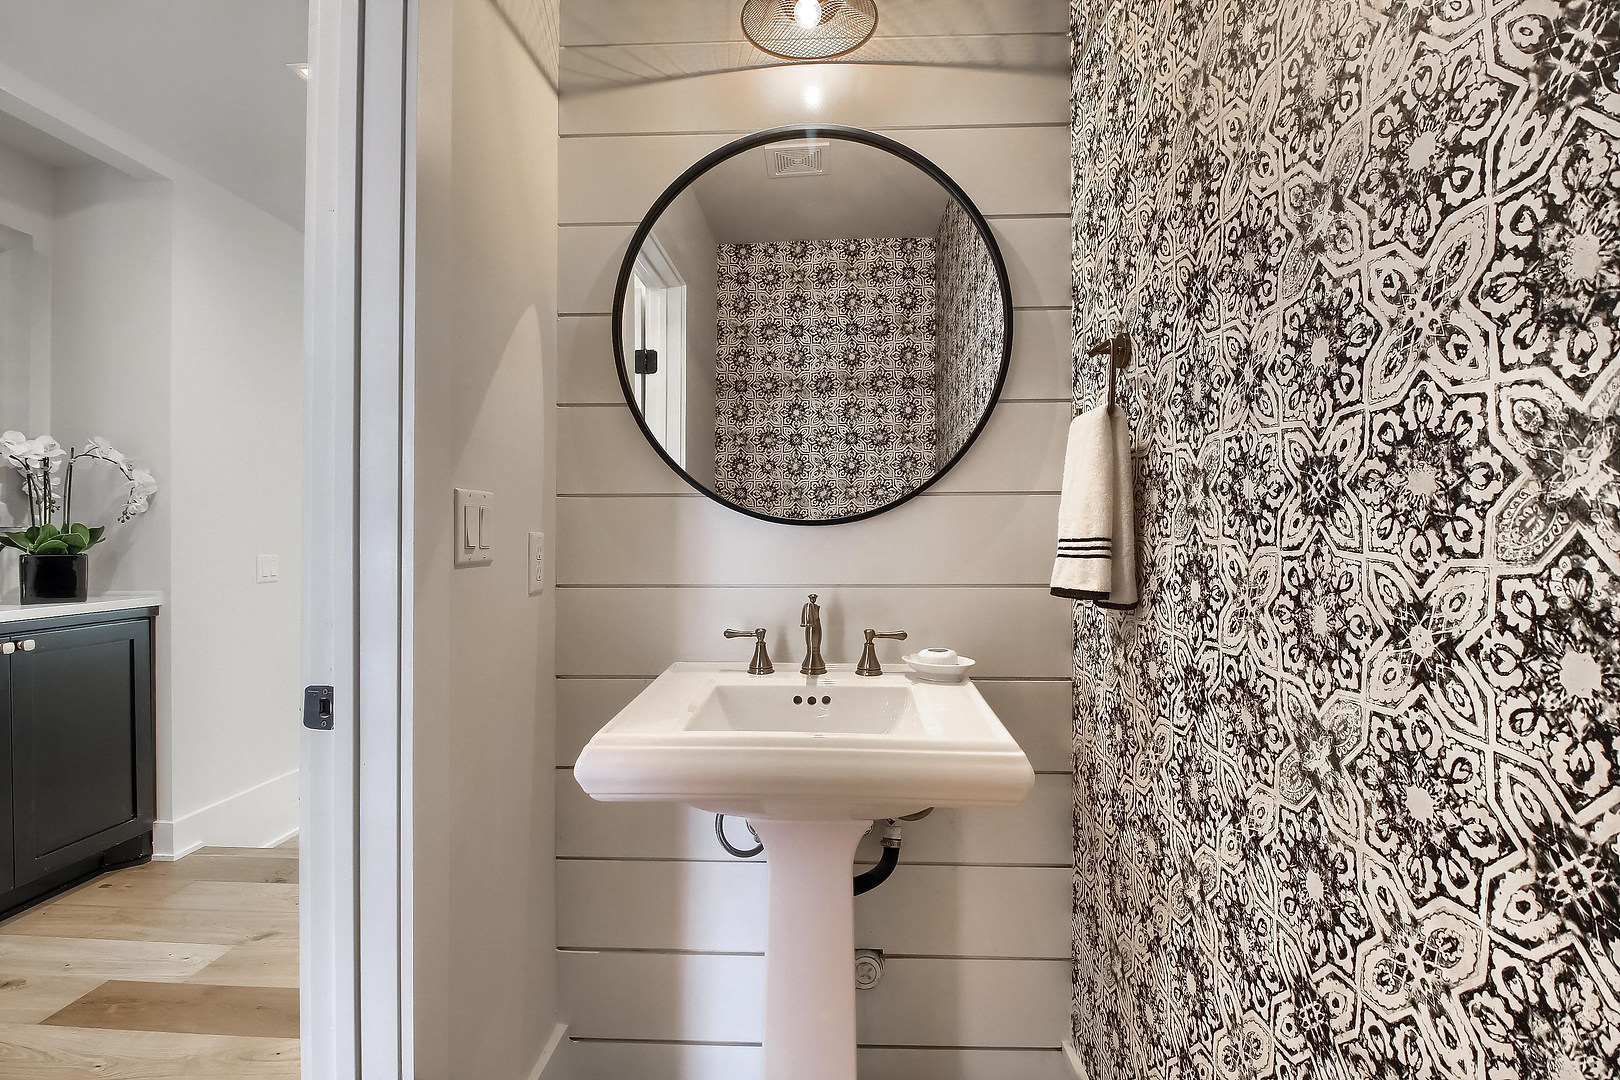 Home Renovation Half Bathroom Wallpaper on West 29th in Austin, Texas